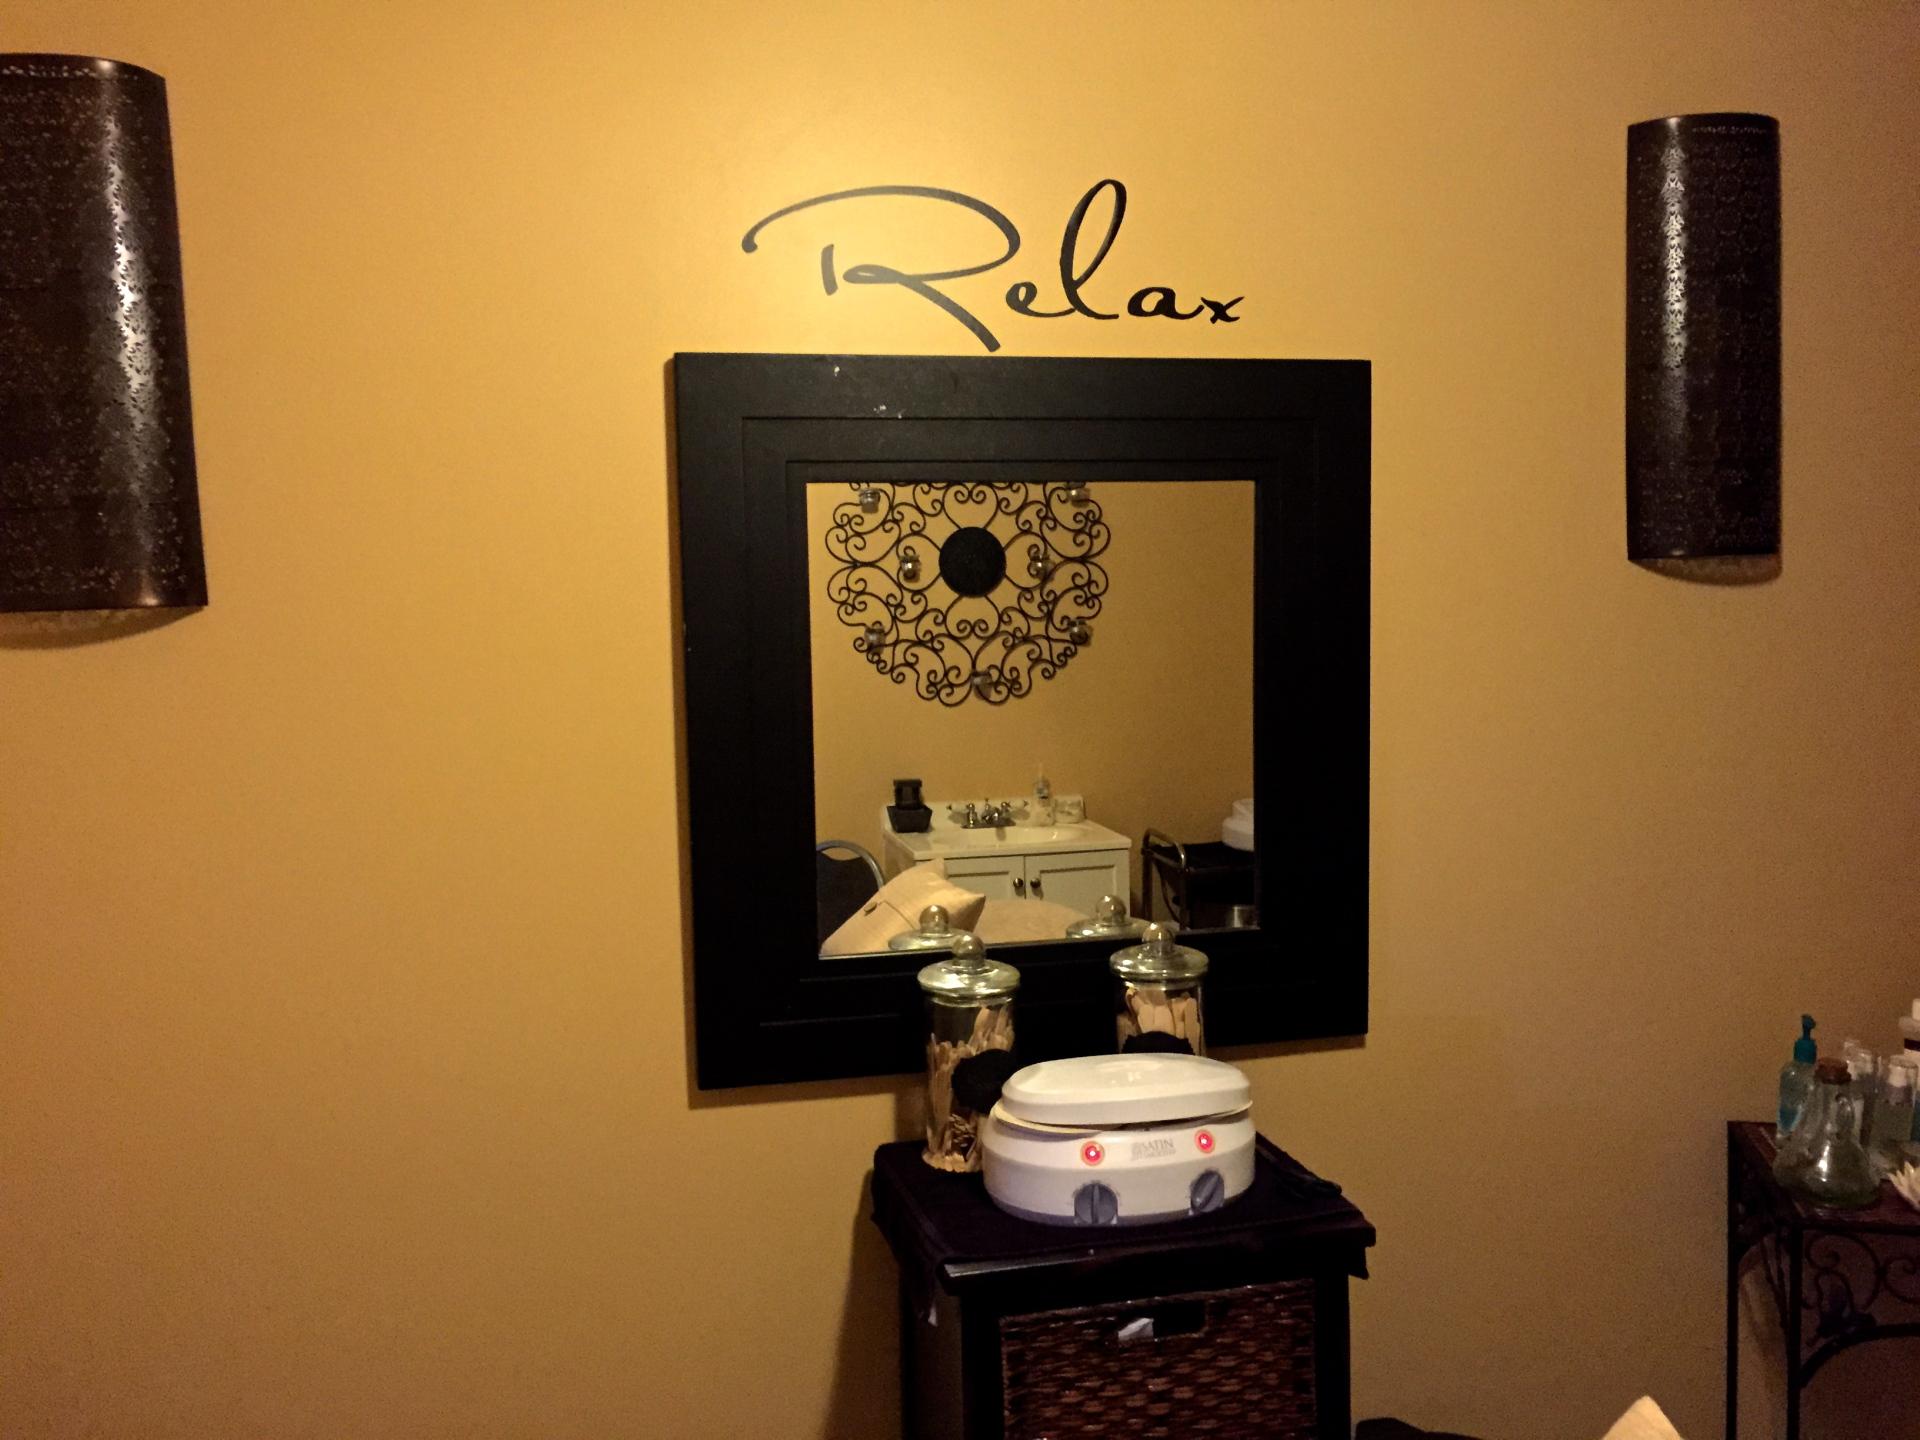 Relax, waxing, esthetics